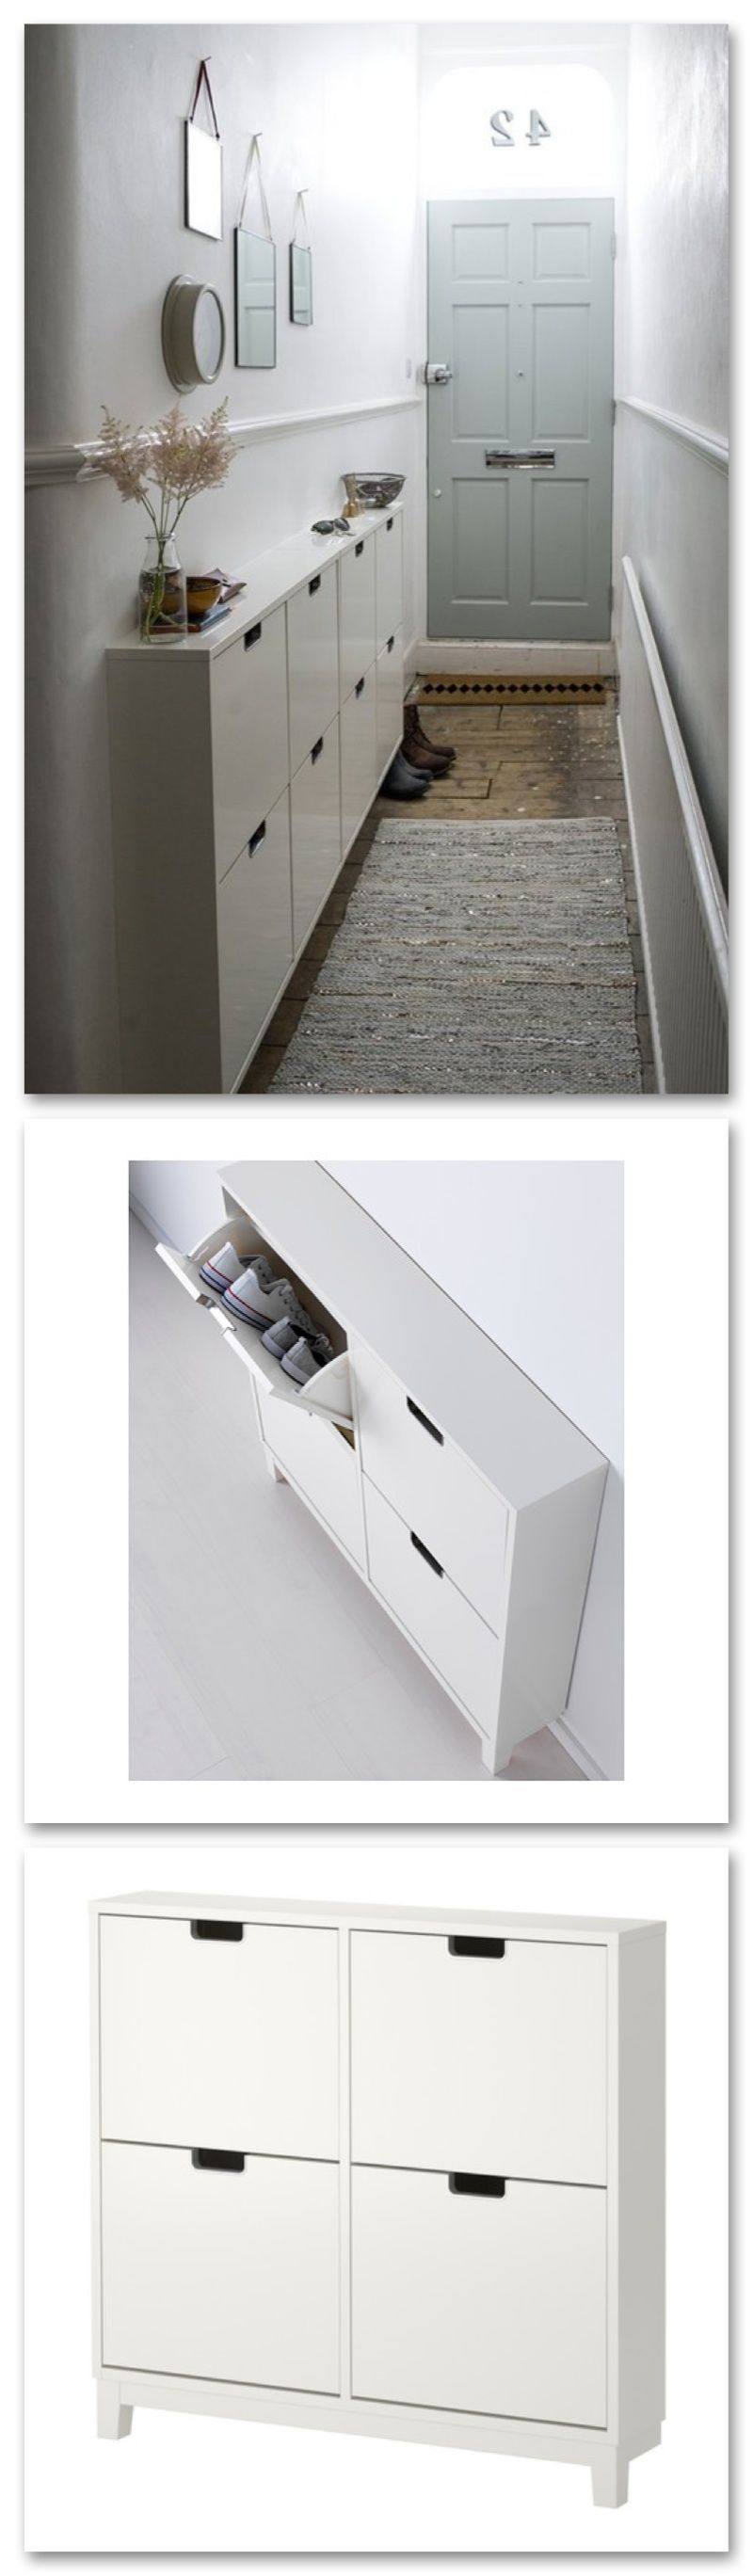 STÄLL Shoe cabinet with compartments blackbrown Ayakkabılık